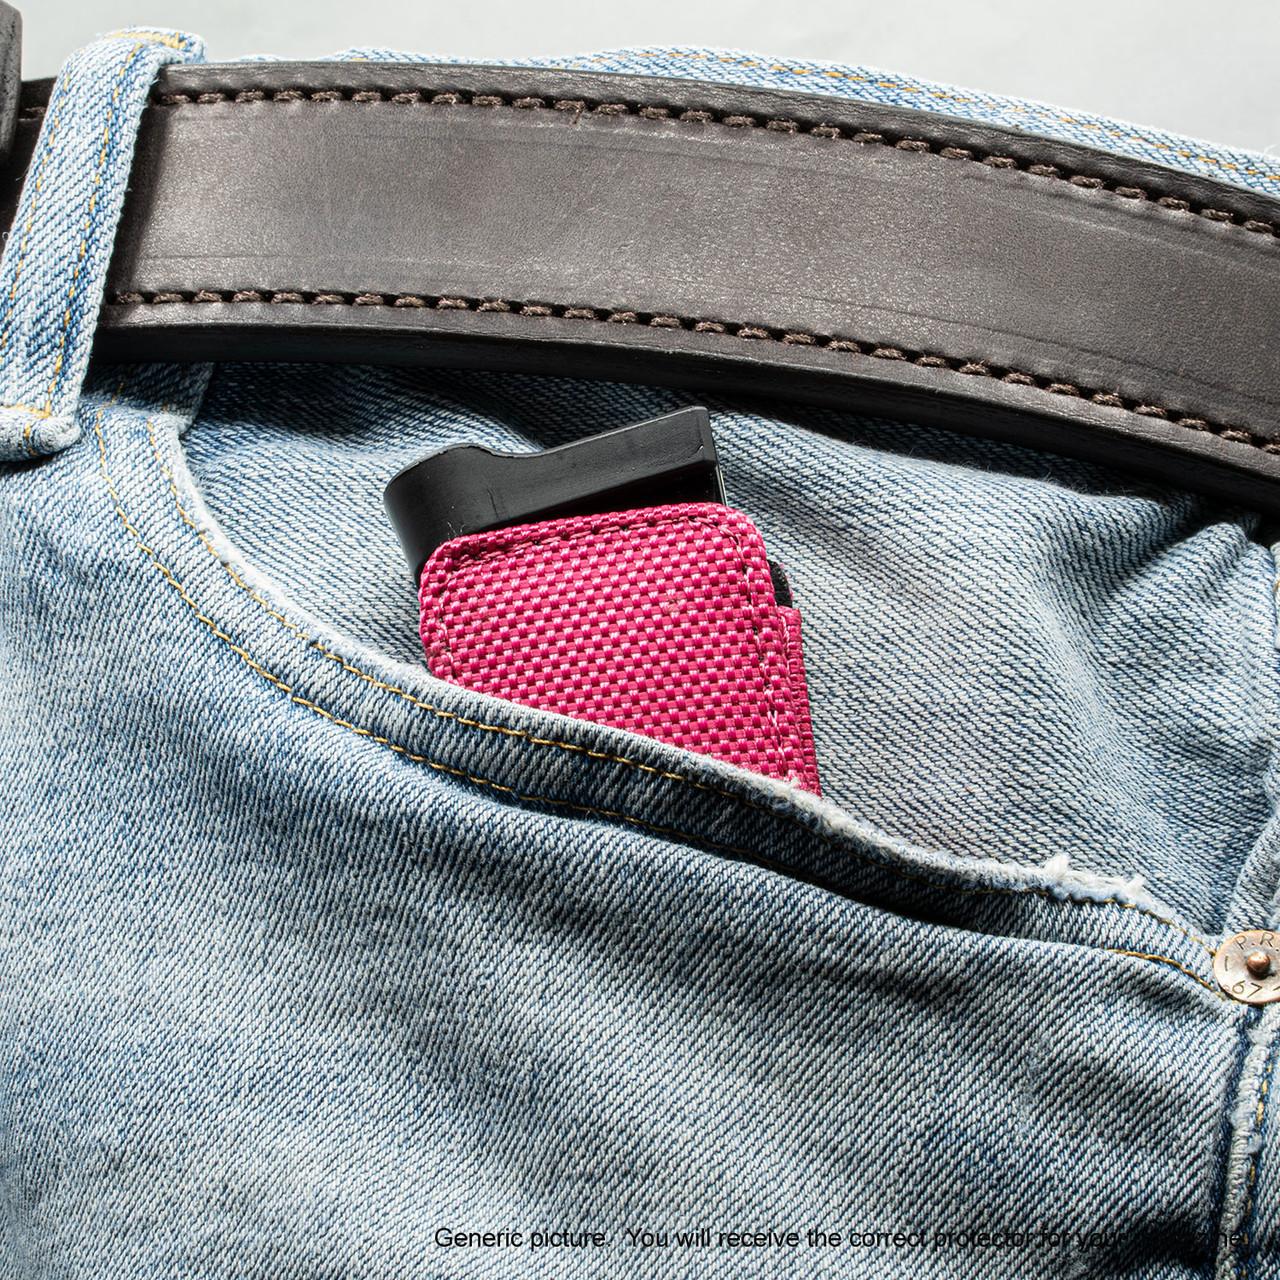 Mossberg MC2c Pink Covert Magazine Pocket Protector